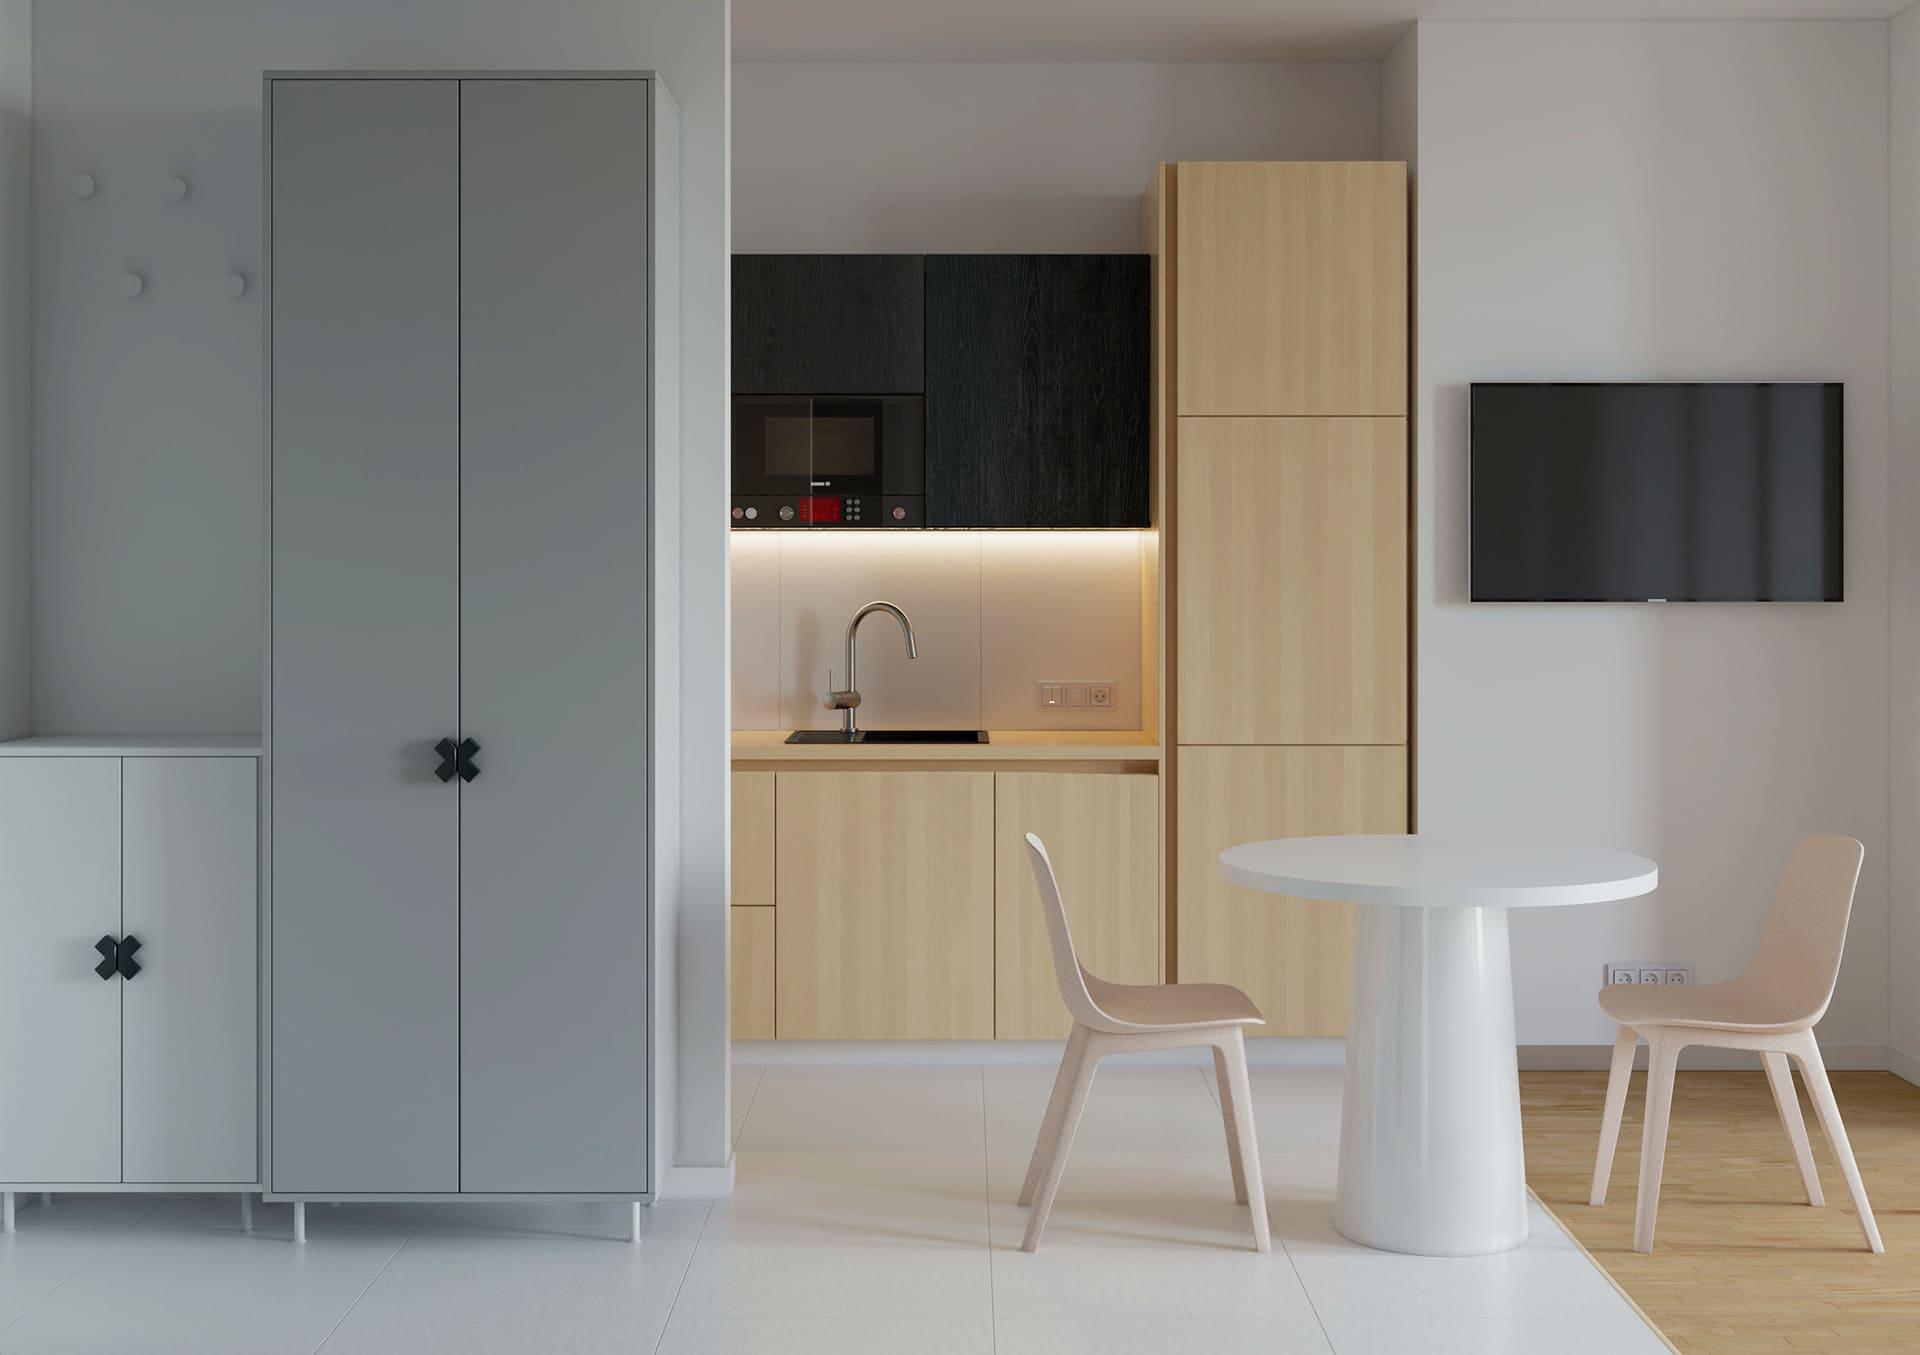 модный дизайн интерьера квартиры фото 29